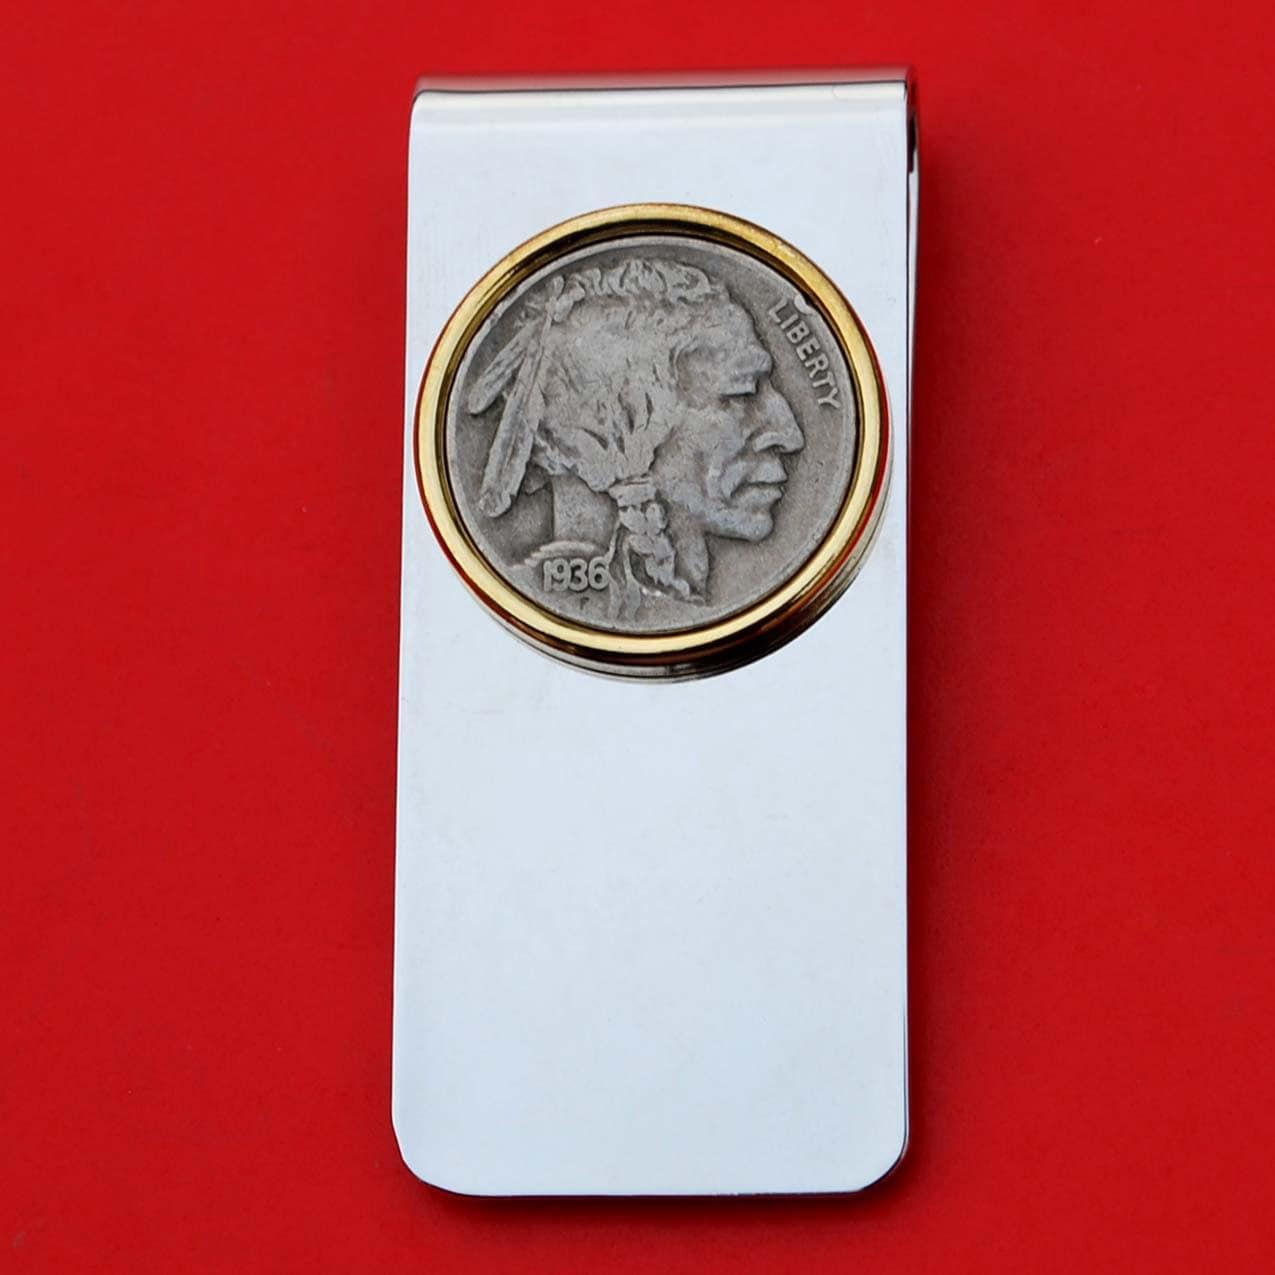 US-Indian Head 1936 Buffalo Nickel 5 Cent Münze aus massivem